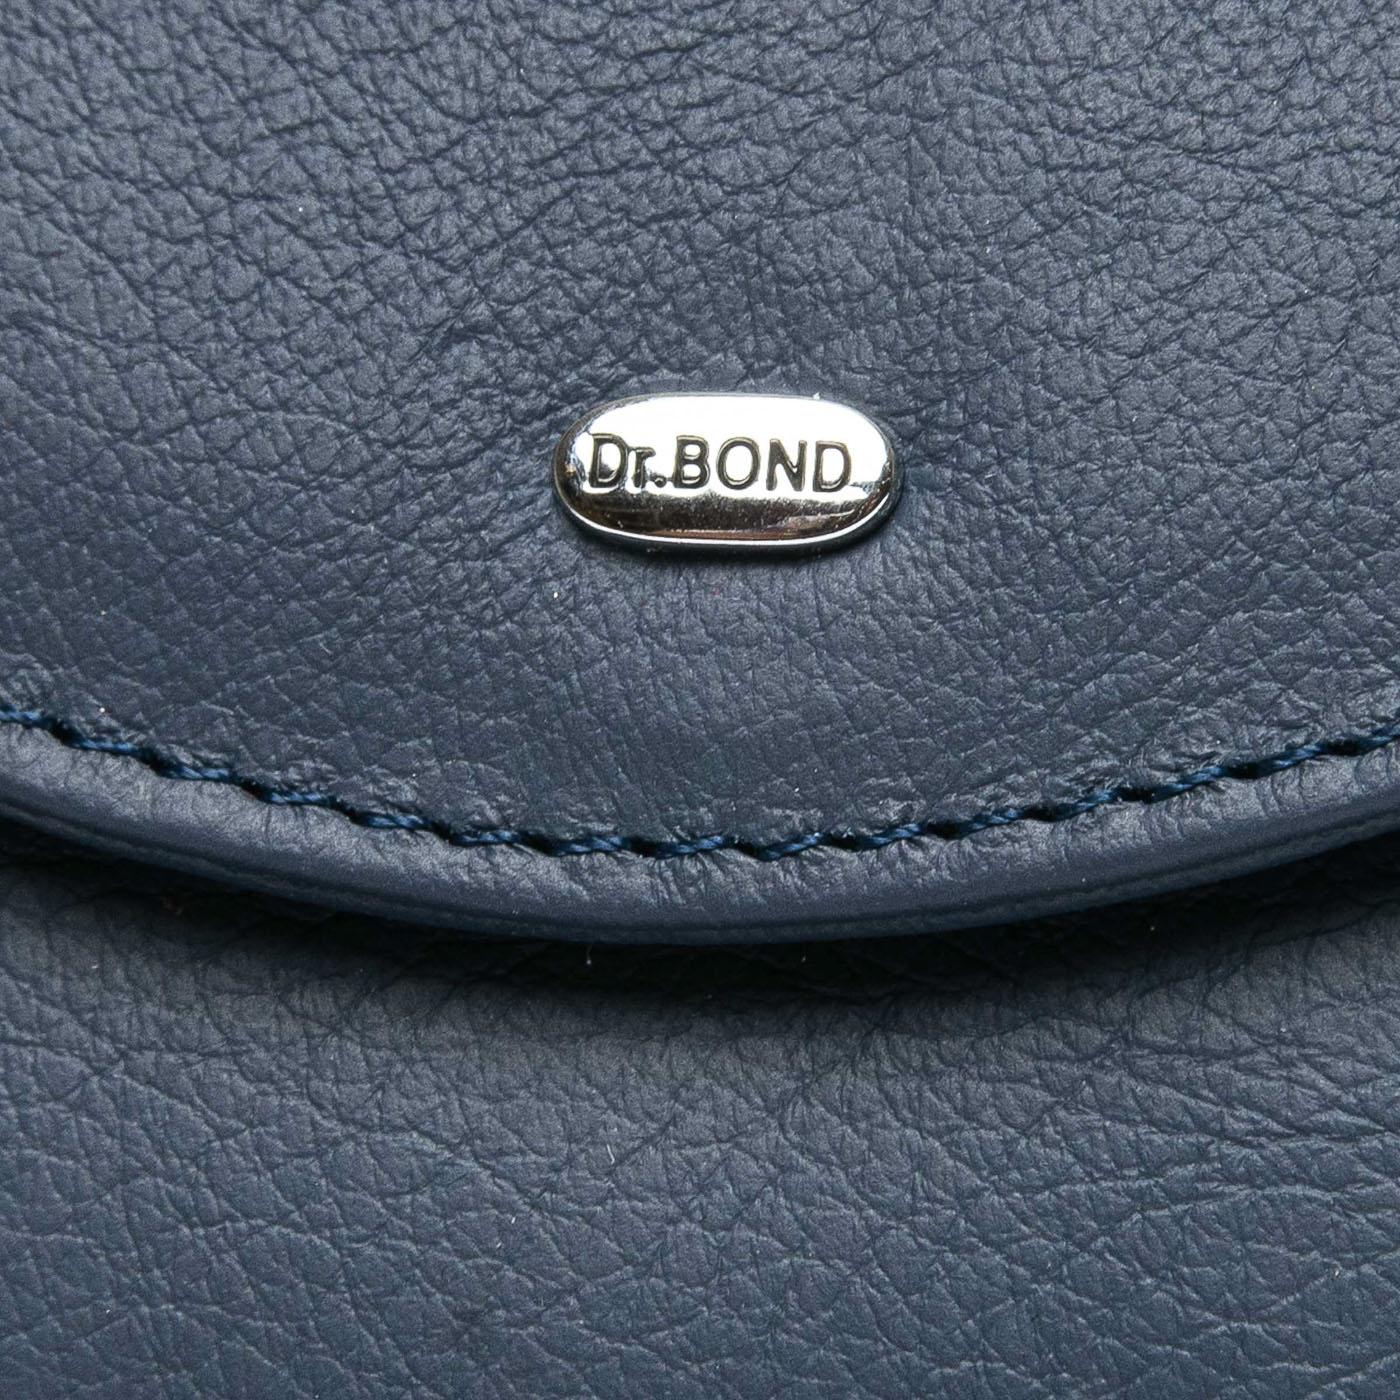 Кошелек Classic кожа DR. BOND WS-4 blue - фото 3